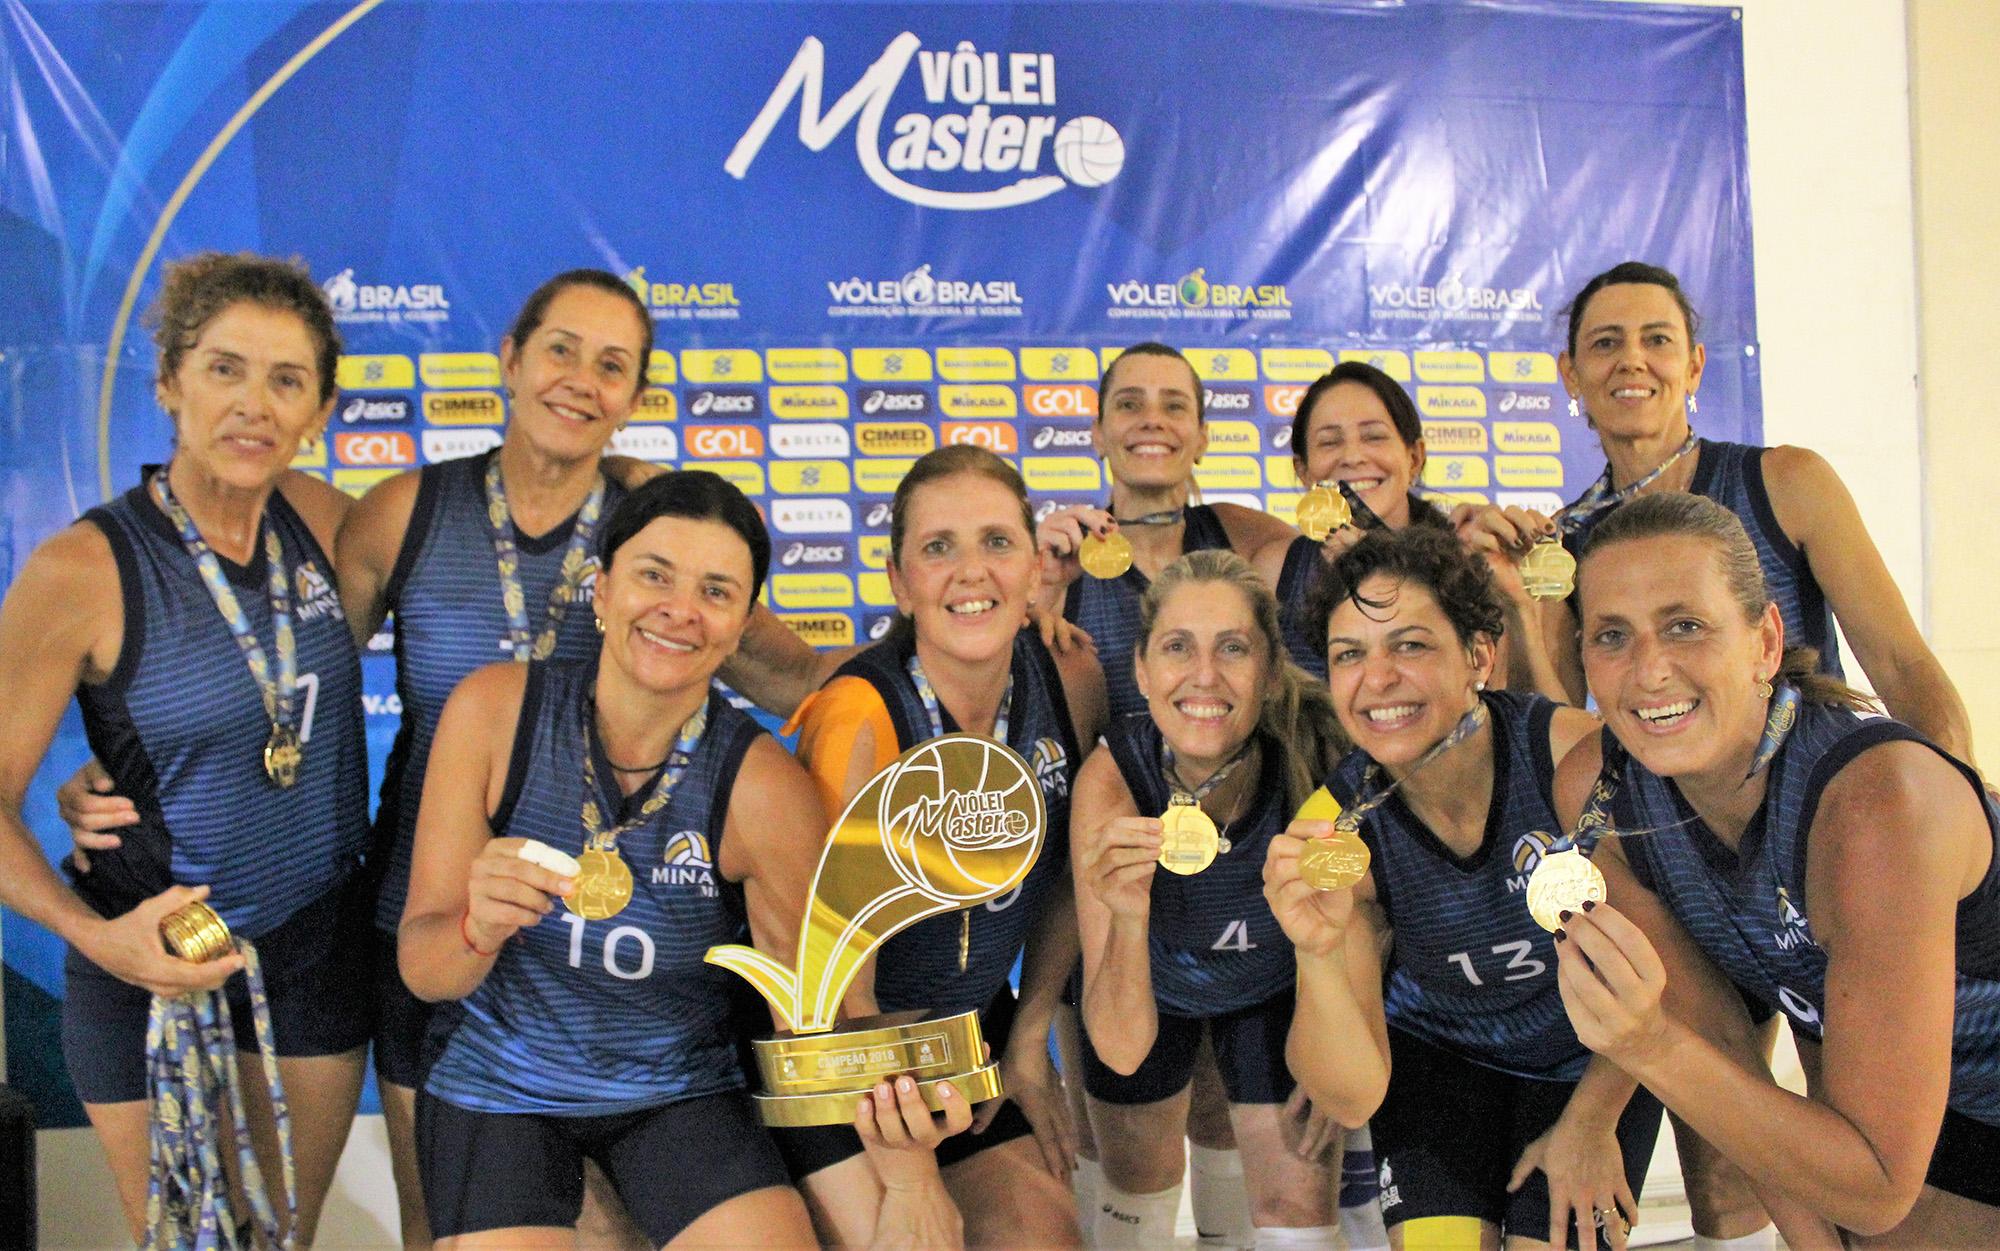 Minas Mix vence e conquista título da 40+ feminina